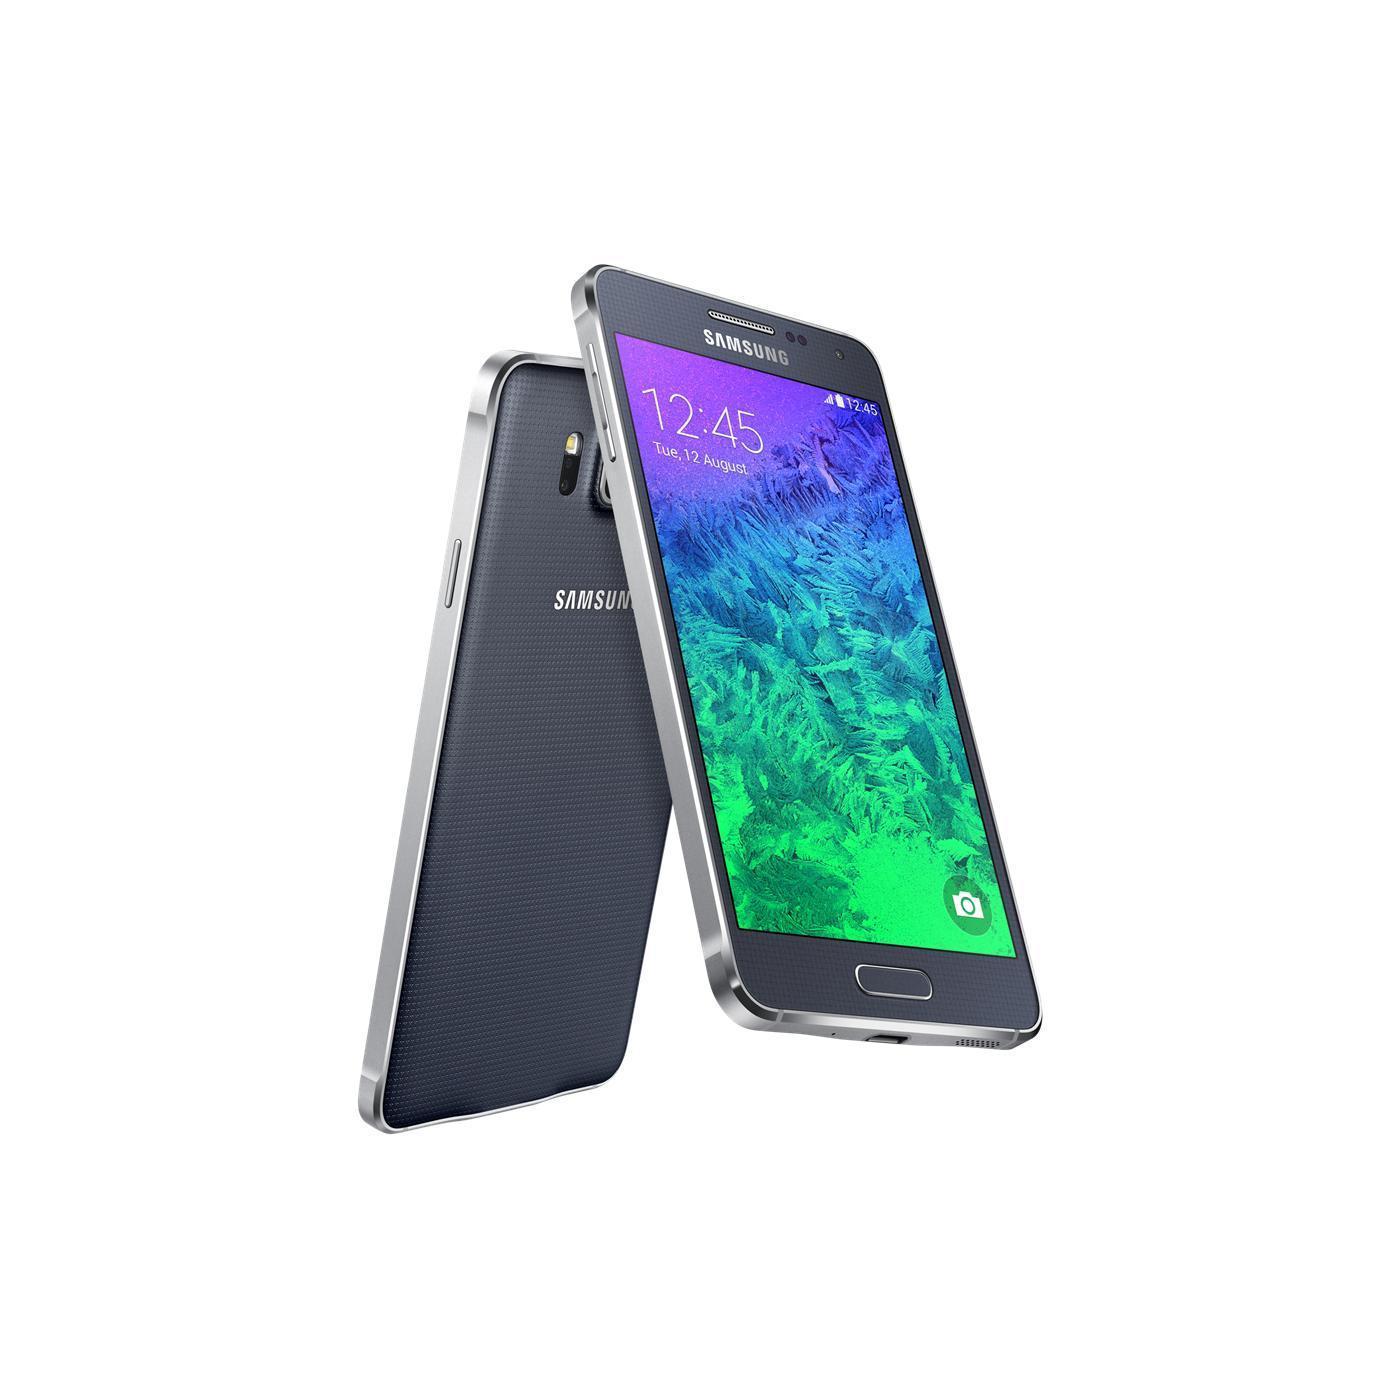 Samsung Galaxy Alpha 32 Go - Noir - Débloqué